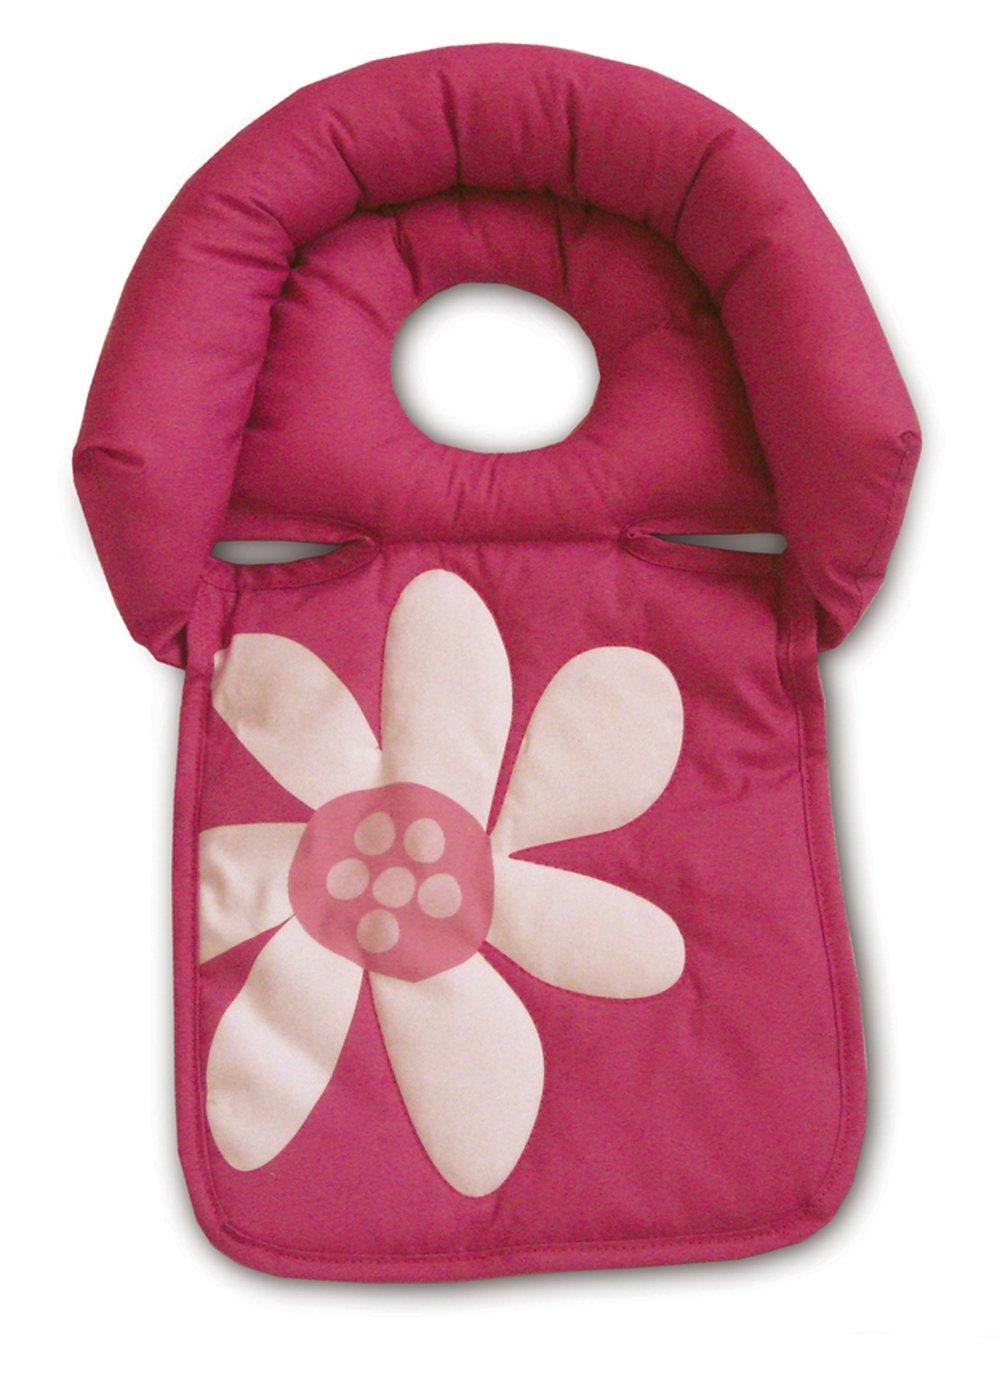 Boppy Noggin Nest Head Support, Pink Flowers The Boppy Company 4100102K6PK